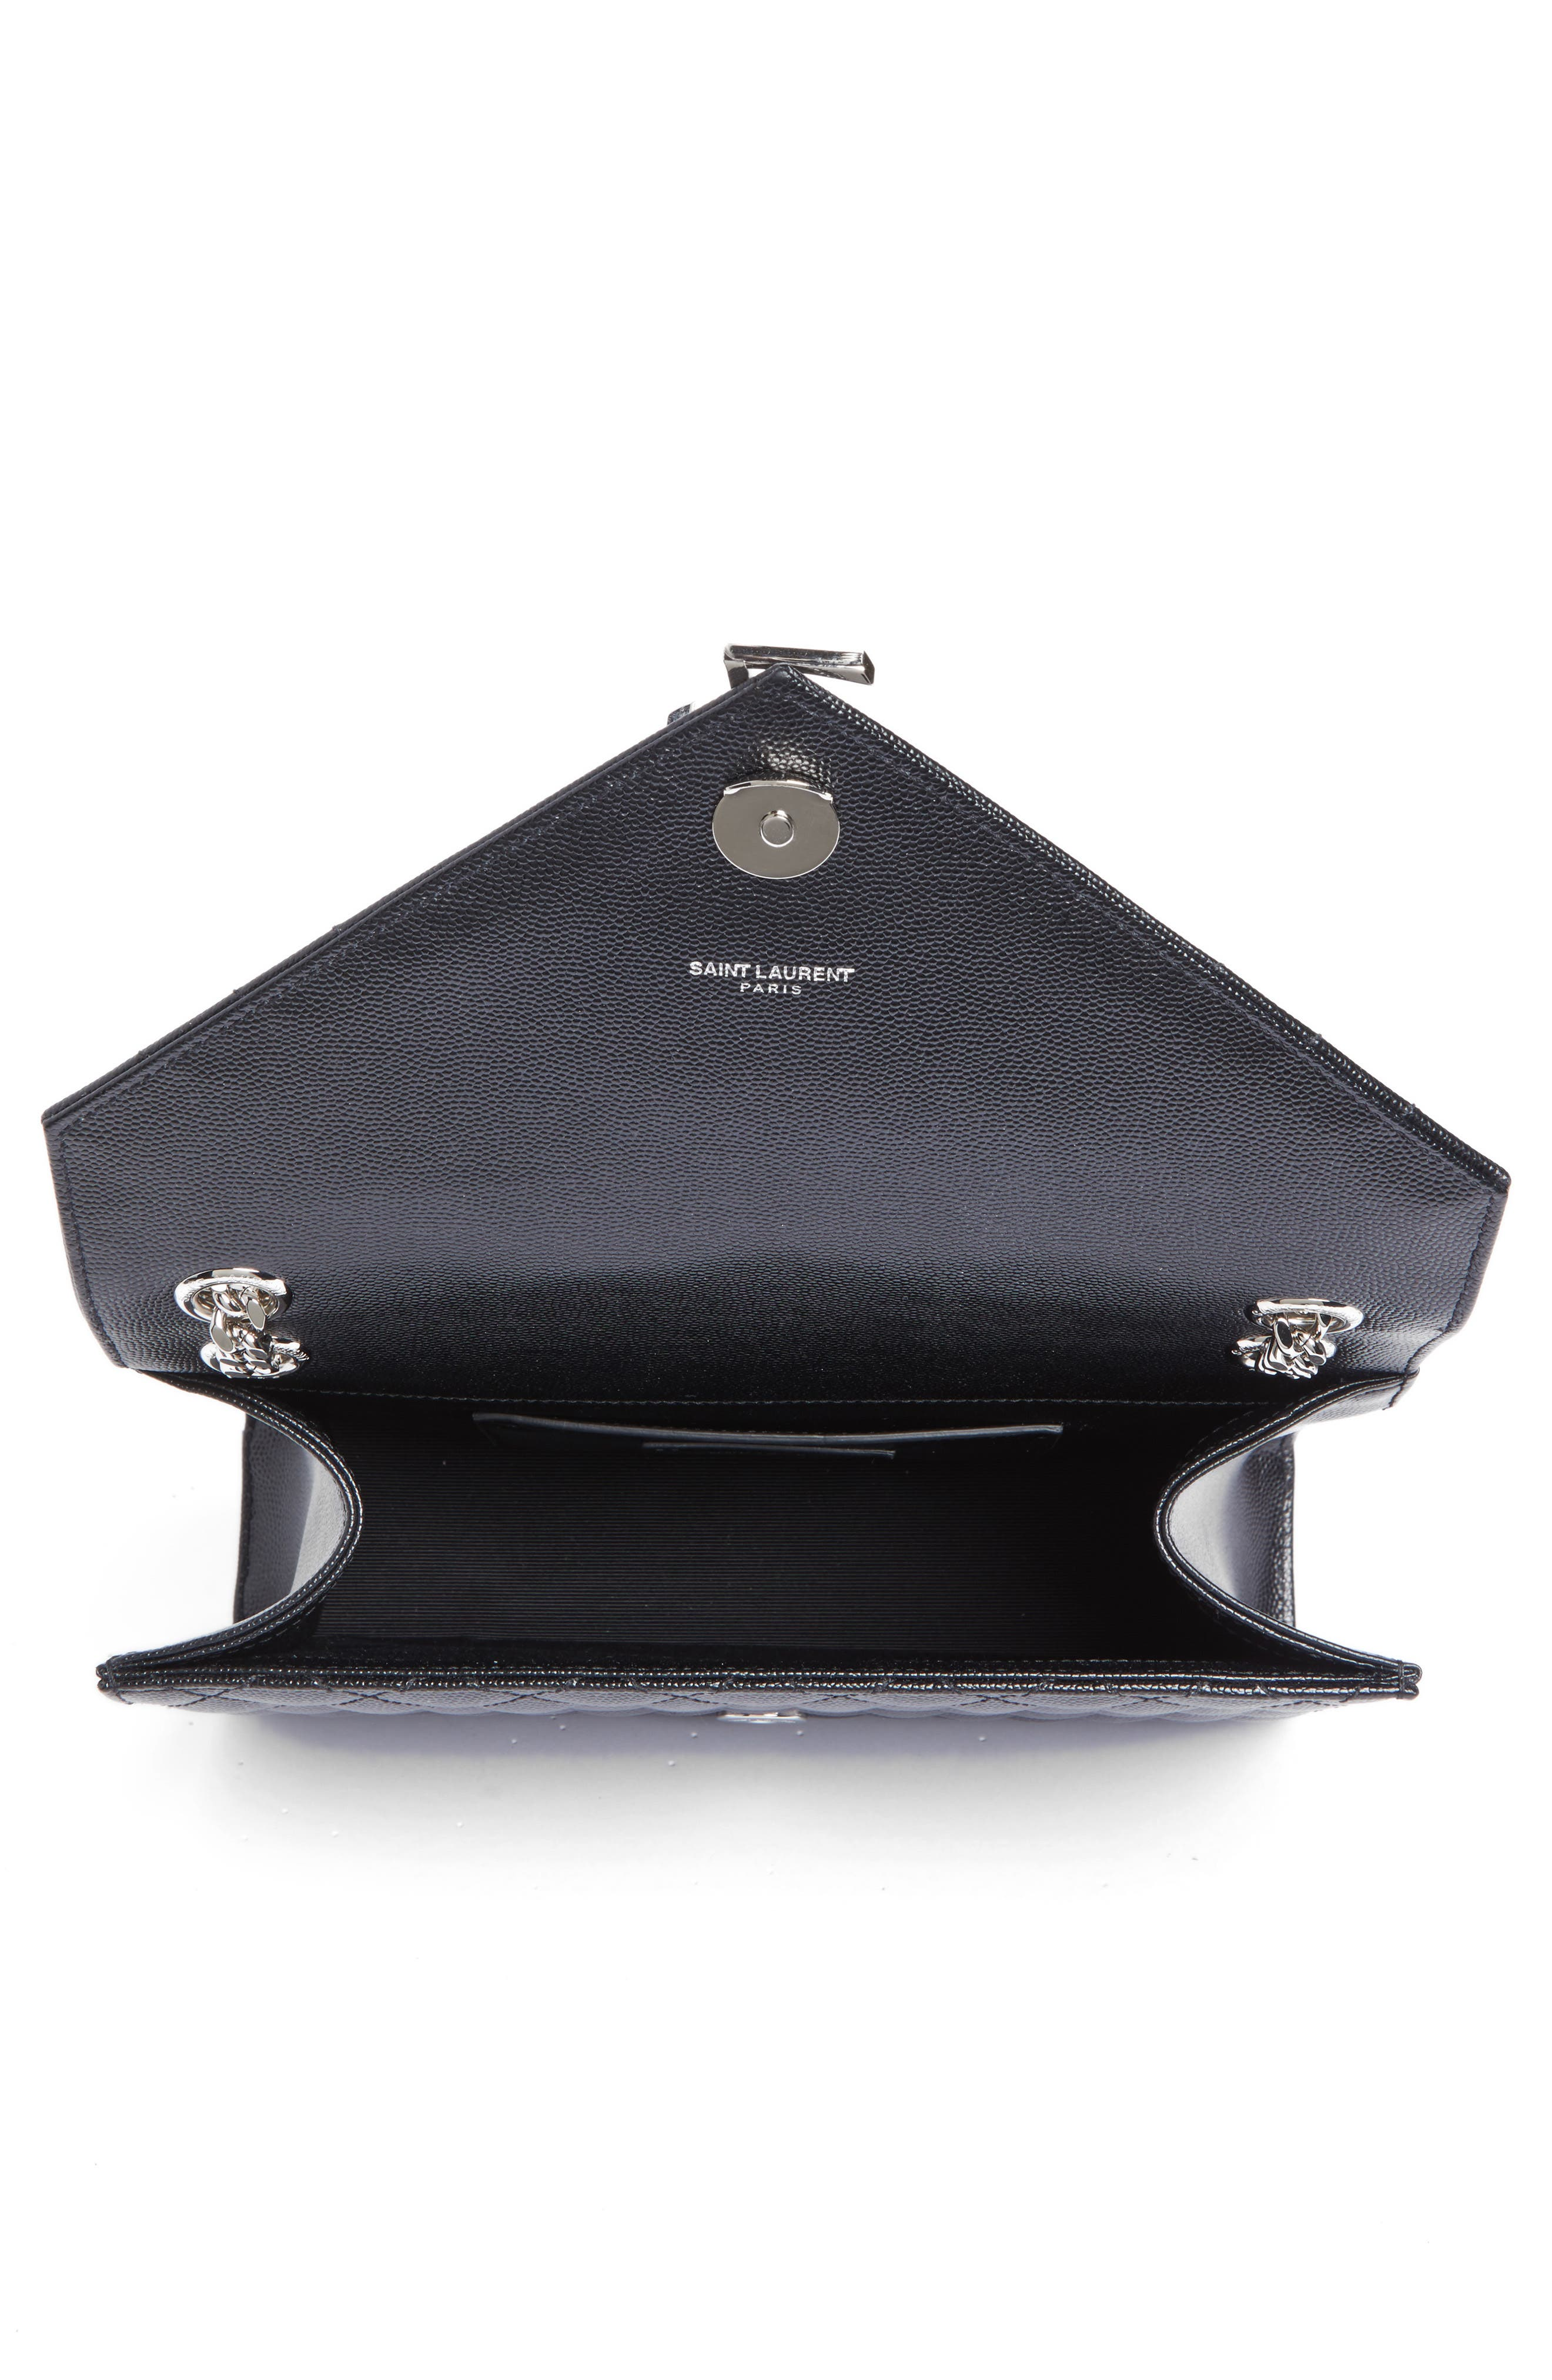 SAINT LAURENT, Large Monogram Quilted Leather Shoulder Bag, Alternate thumbnail 3, color, NERO